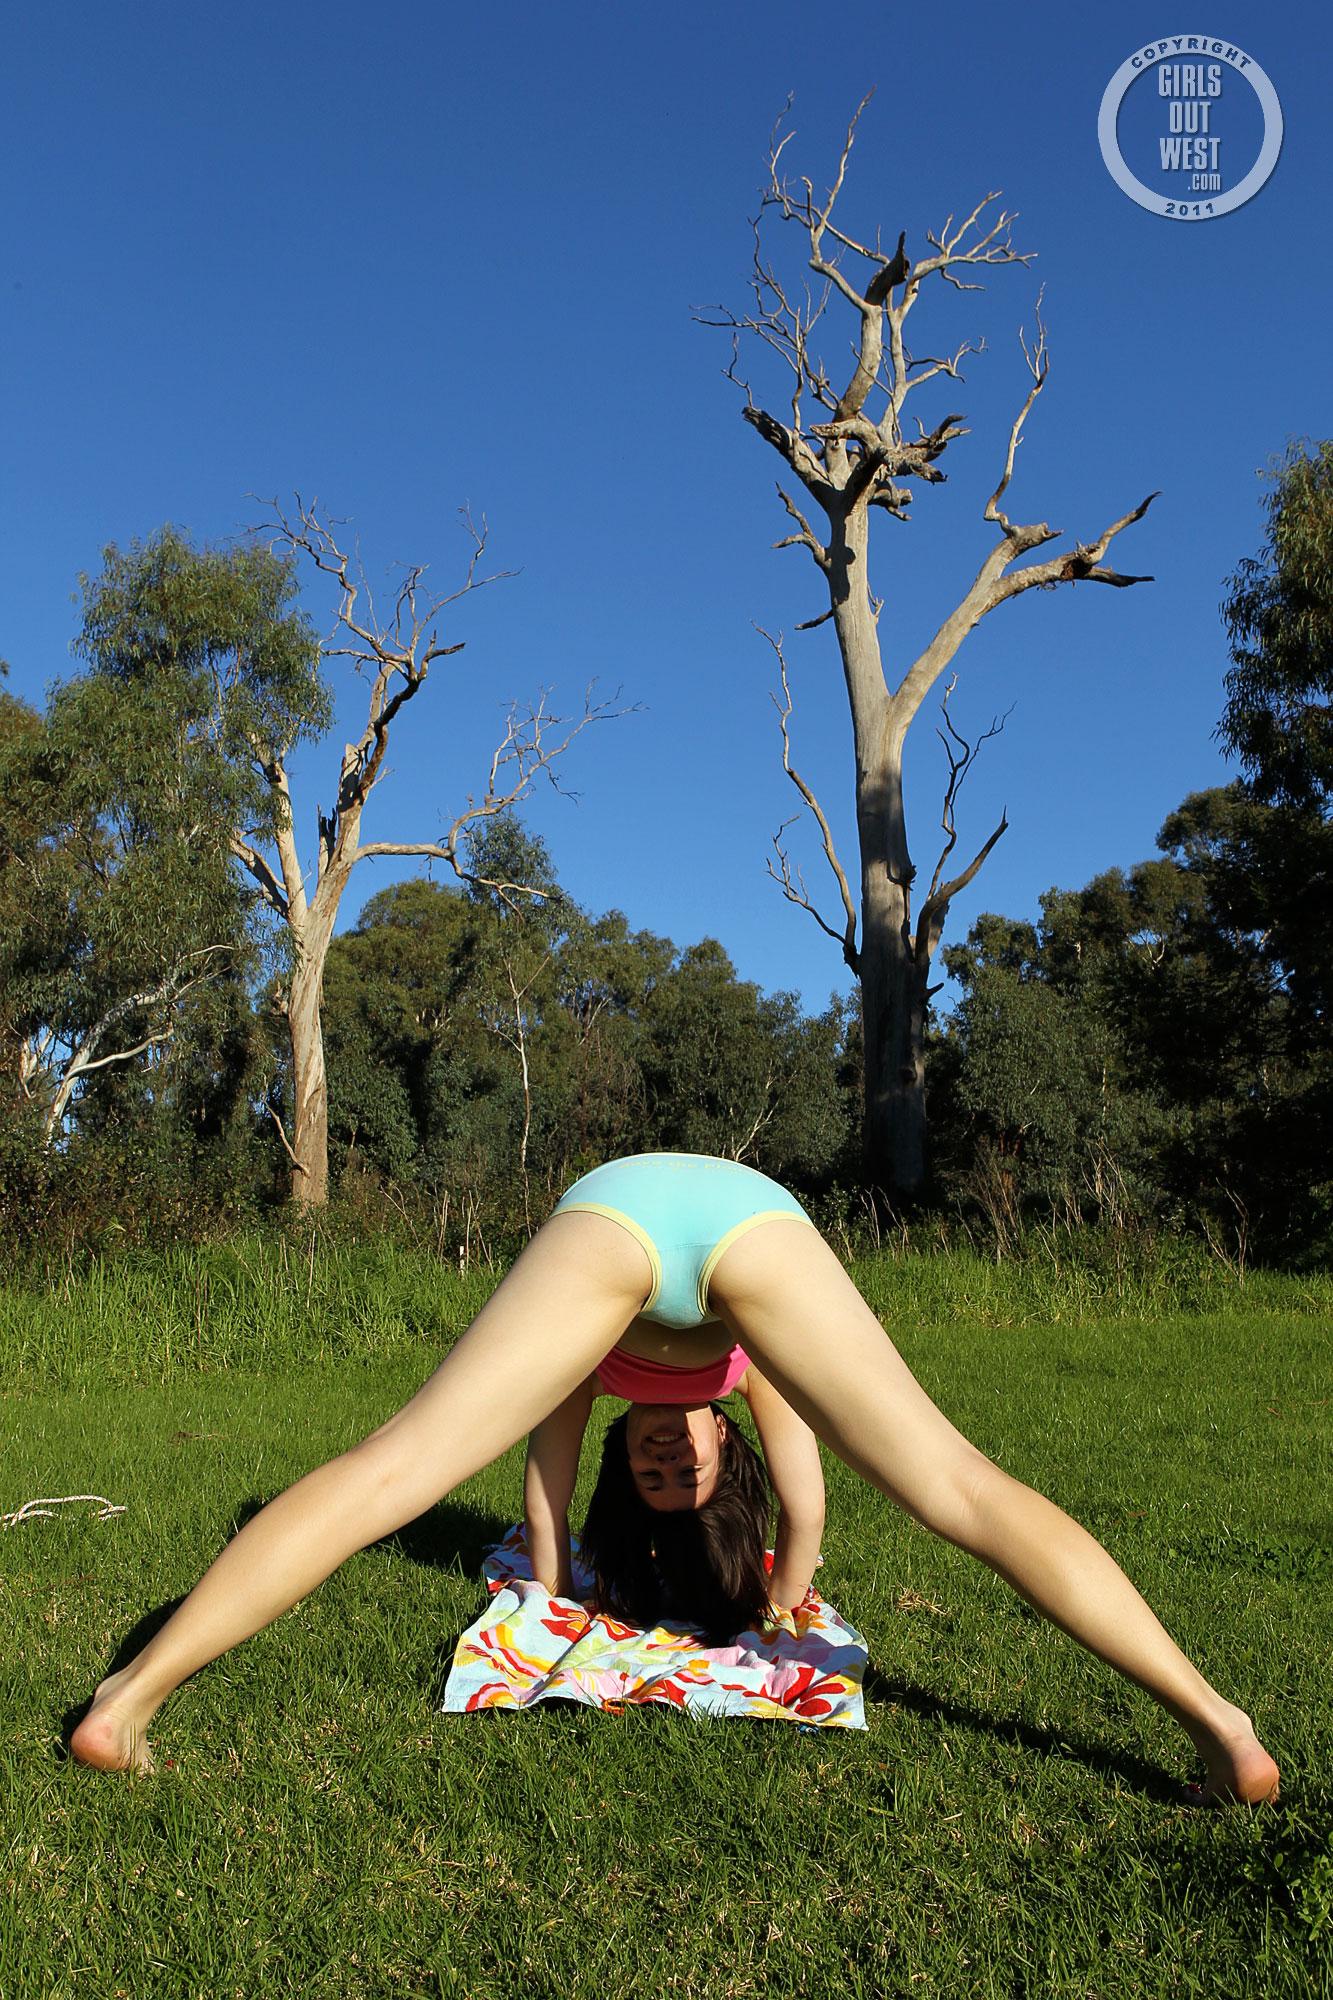 Amigas Haciendo Yoga Porn girls out west saffron fitness saffron's looking pretty in